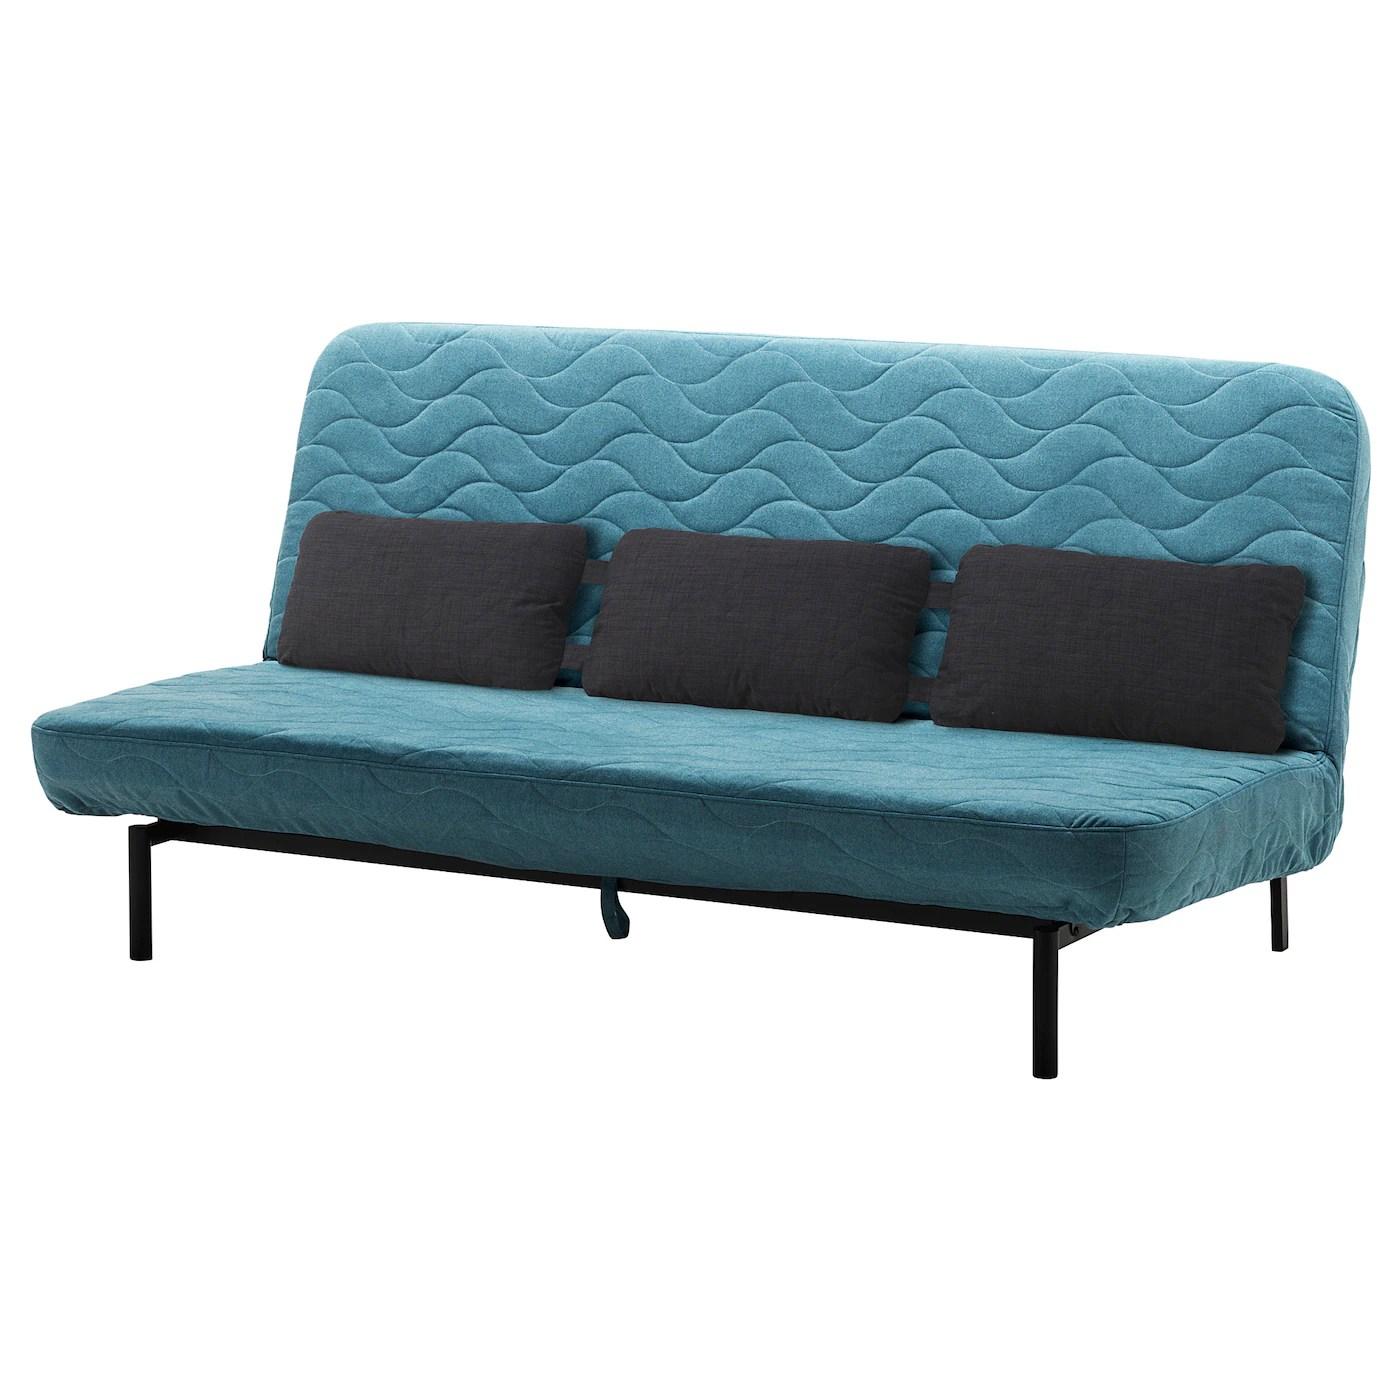 most comfortable ikea sofa everyday sleeping bed beds ireland dublin